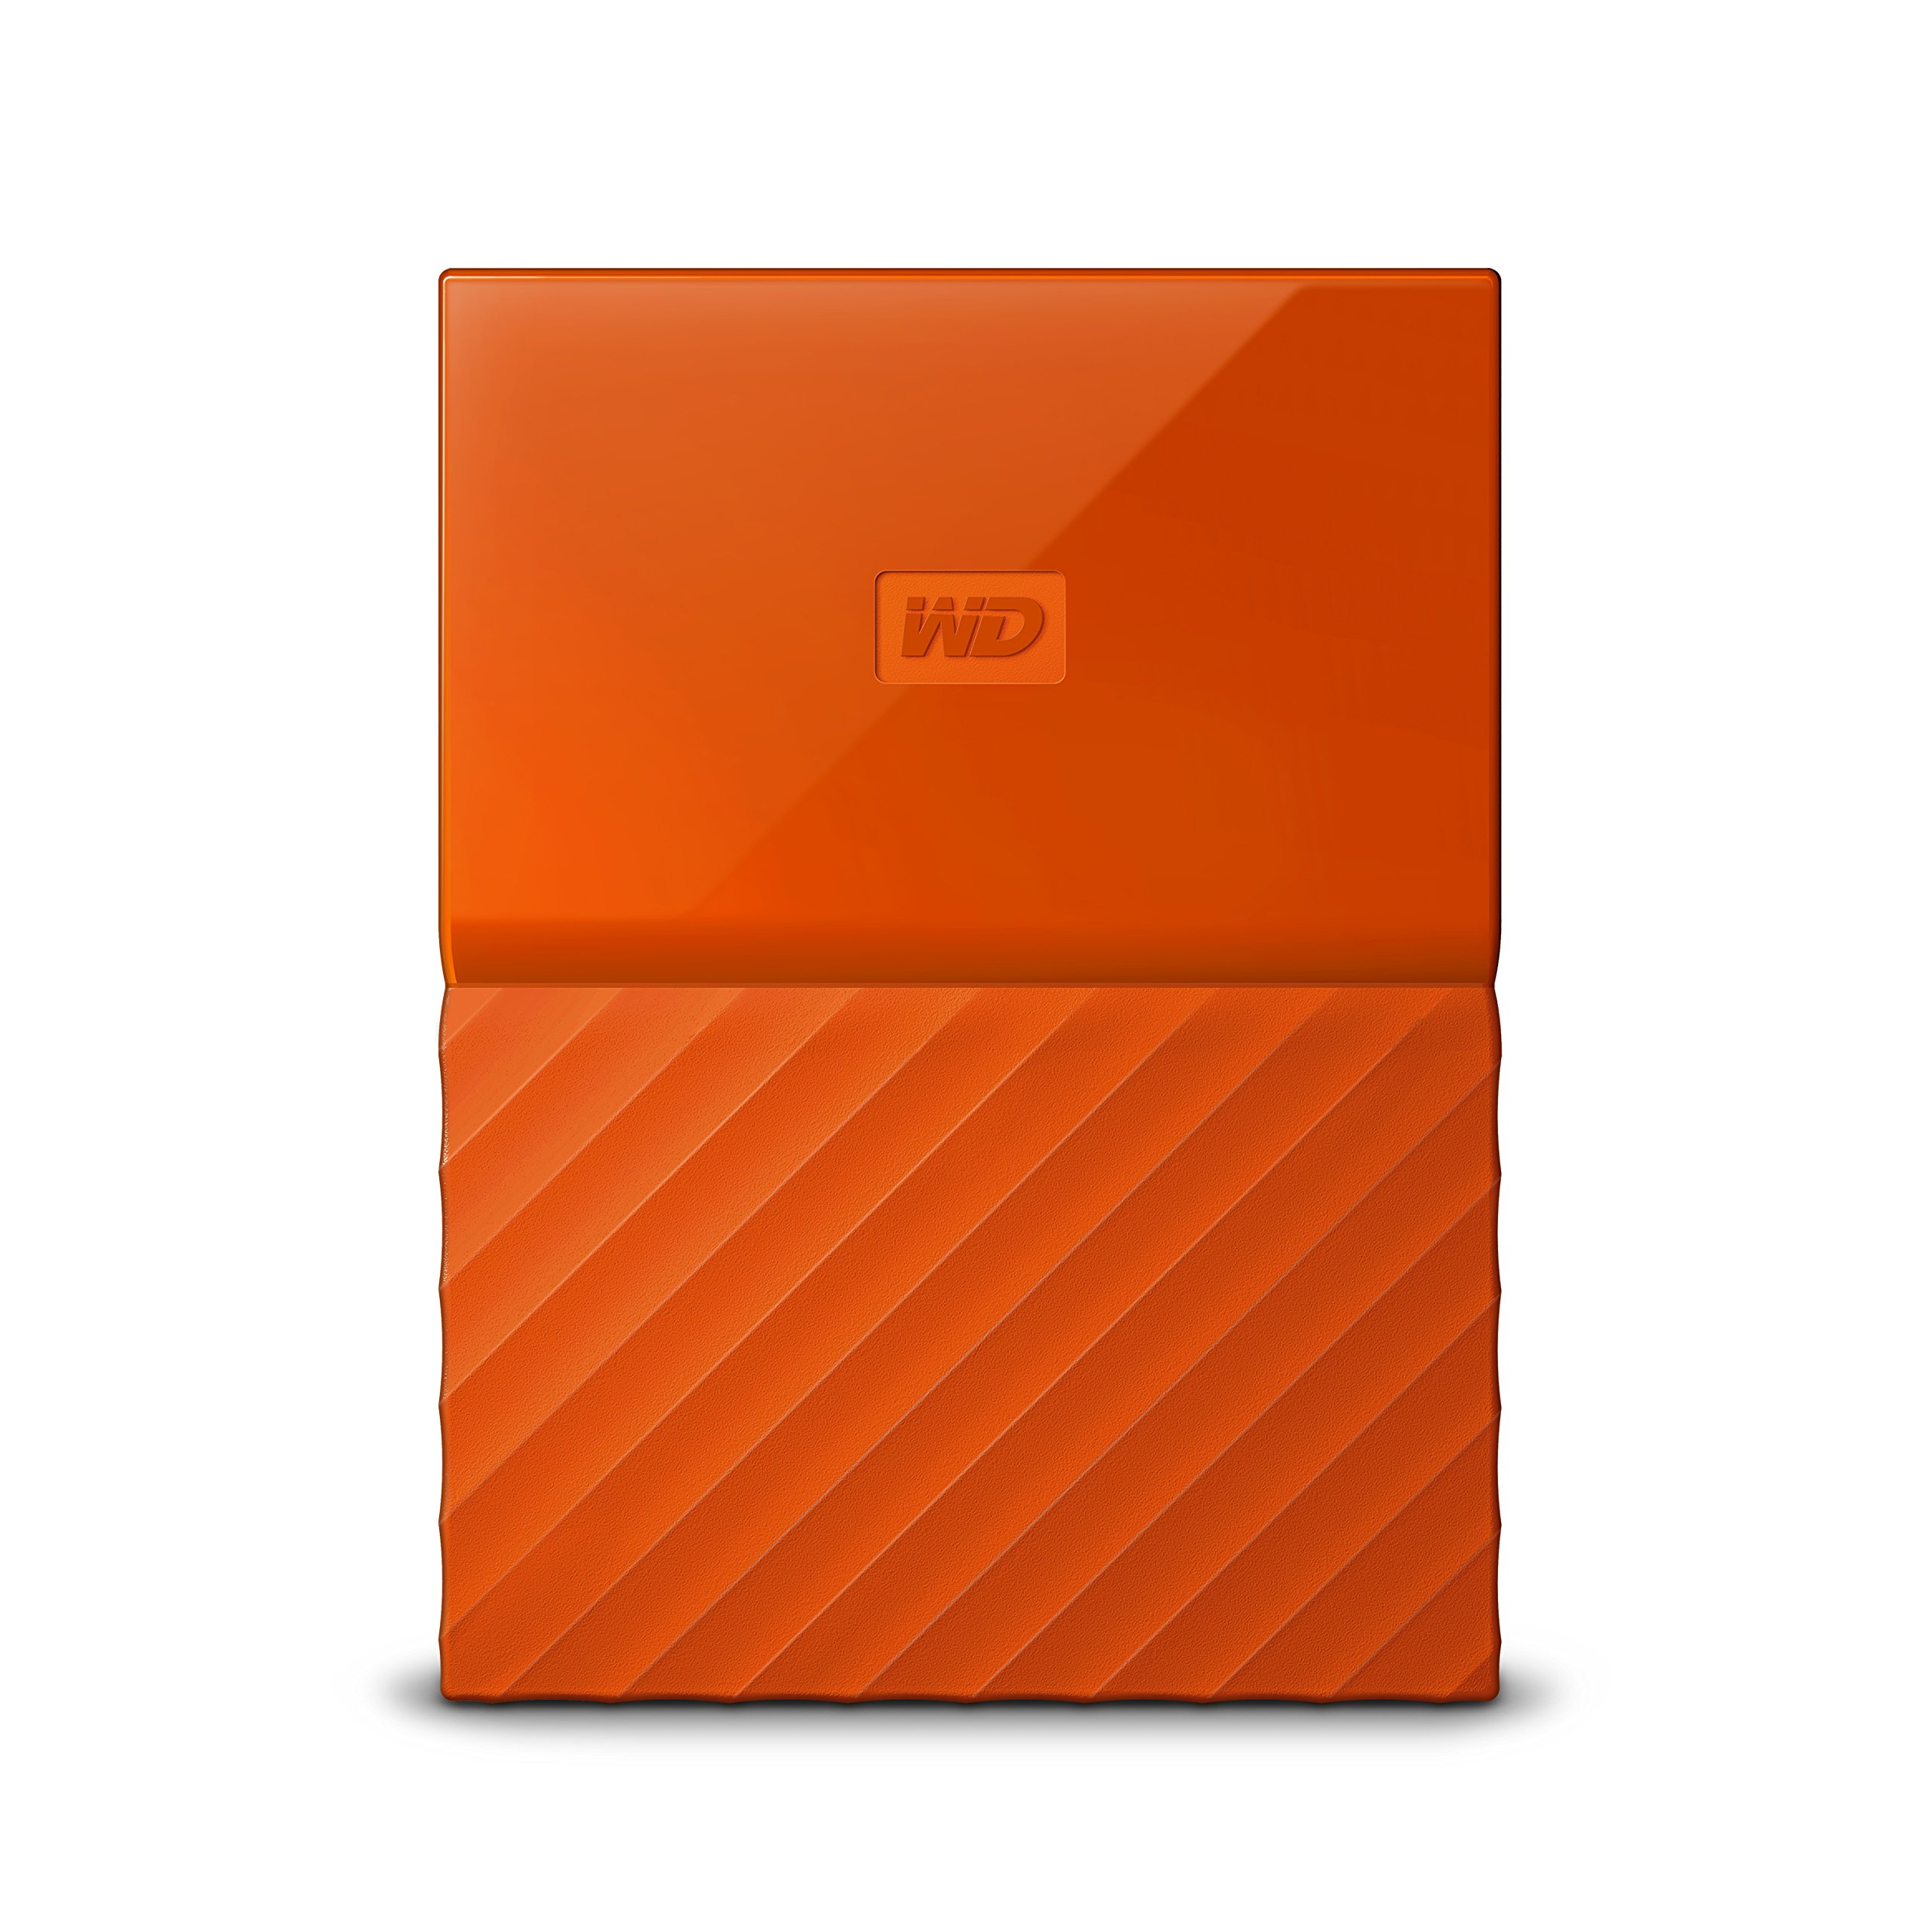 WD 2TB Orange My Passport Portable External Hard Drive - USB 3.0 - WDBYFT0020BOR-WESN